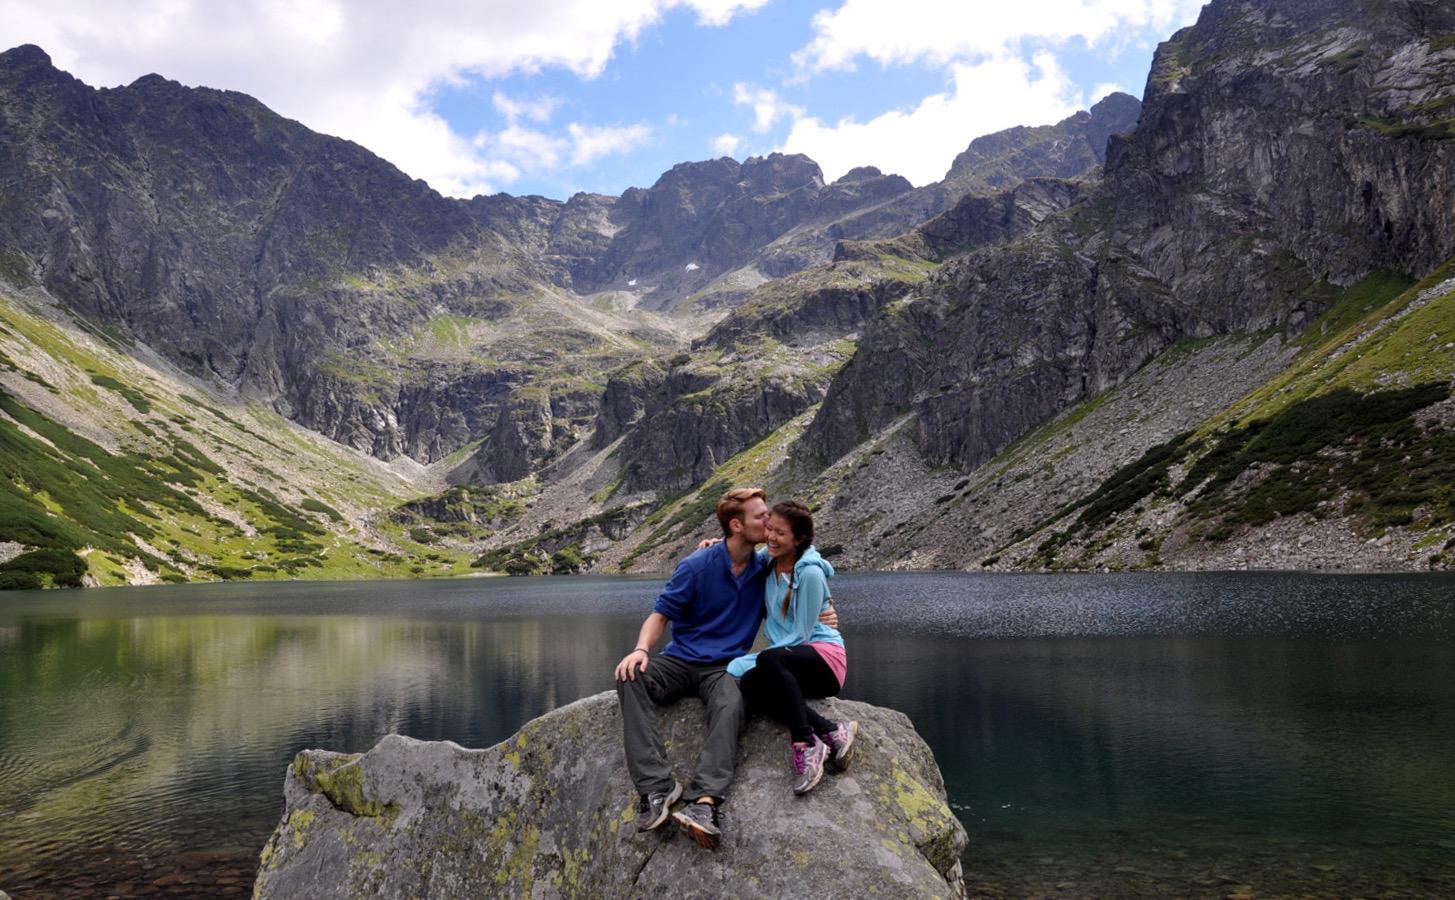 Zakopane Lake Traveling with a Girl